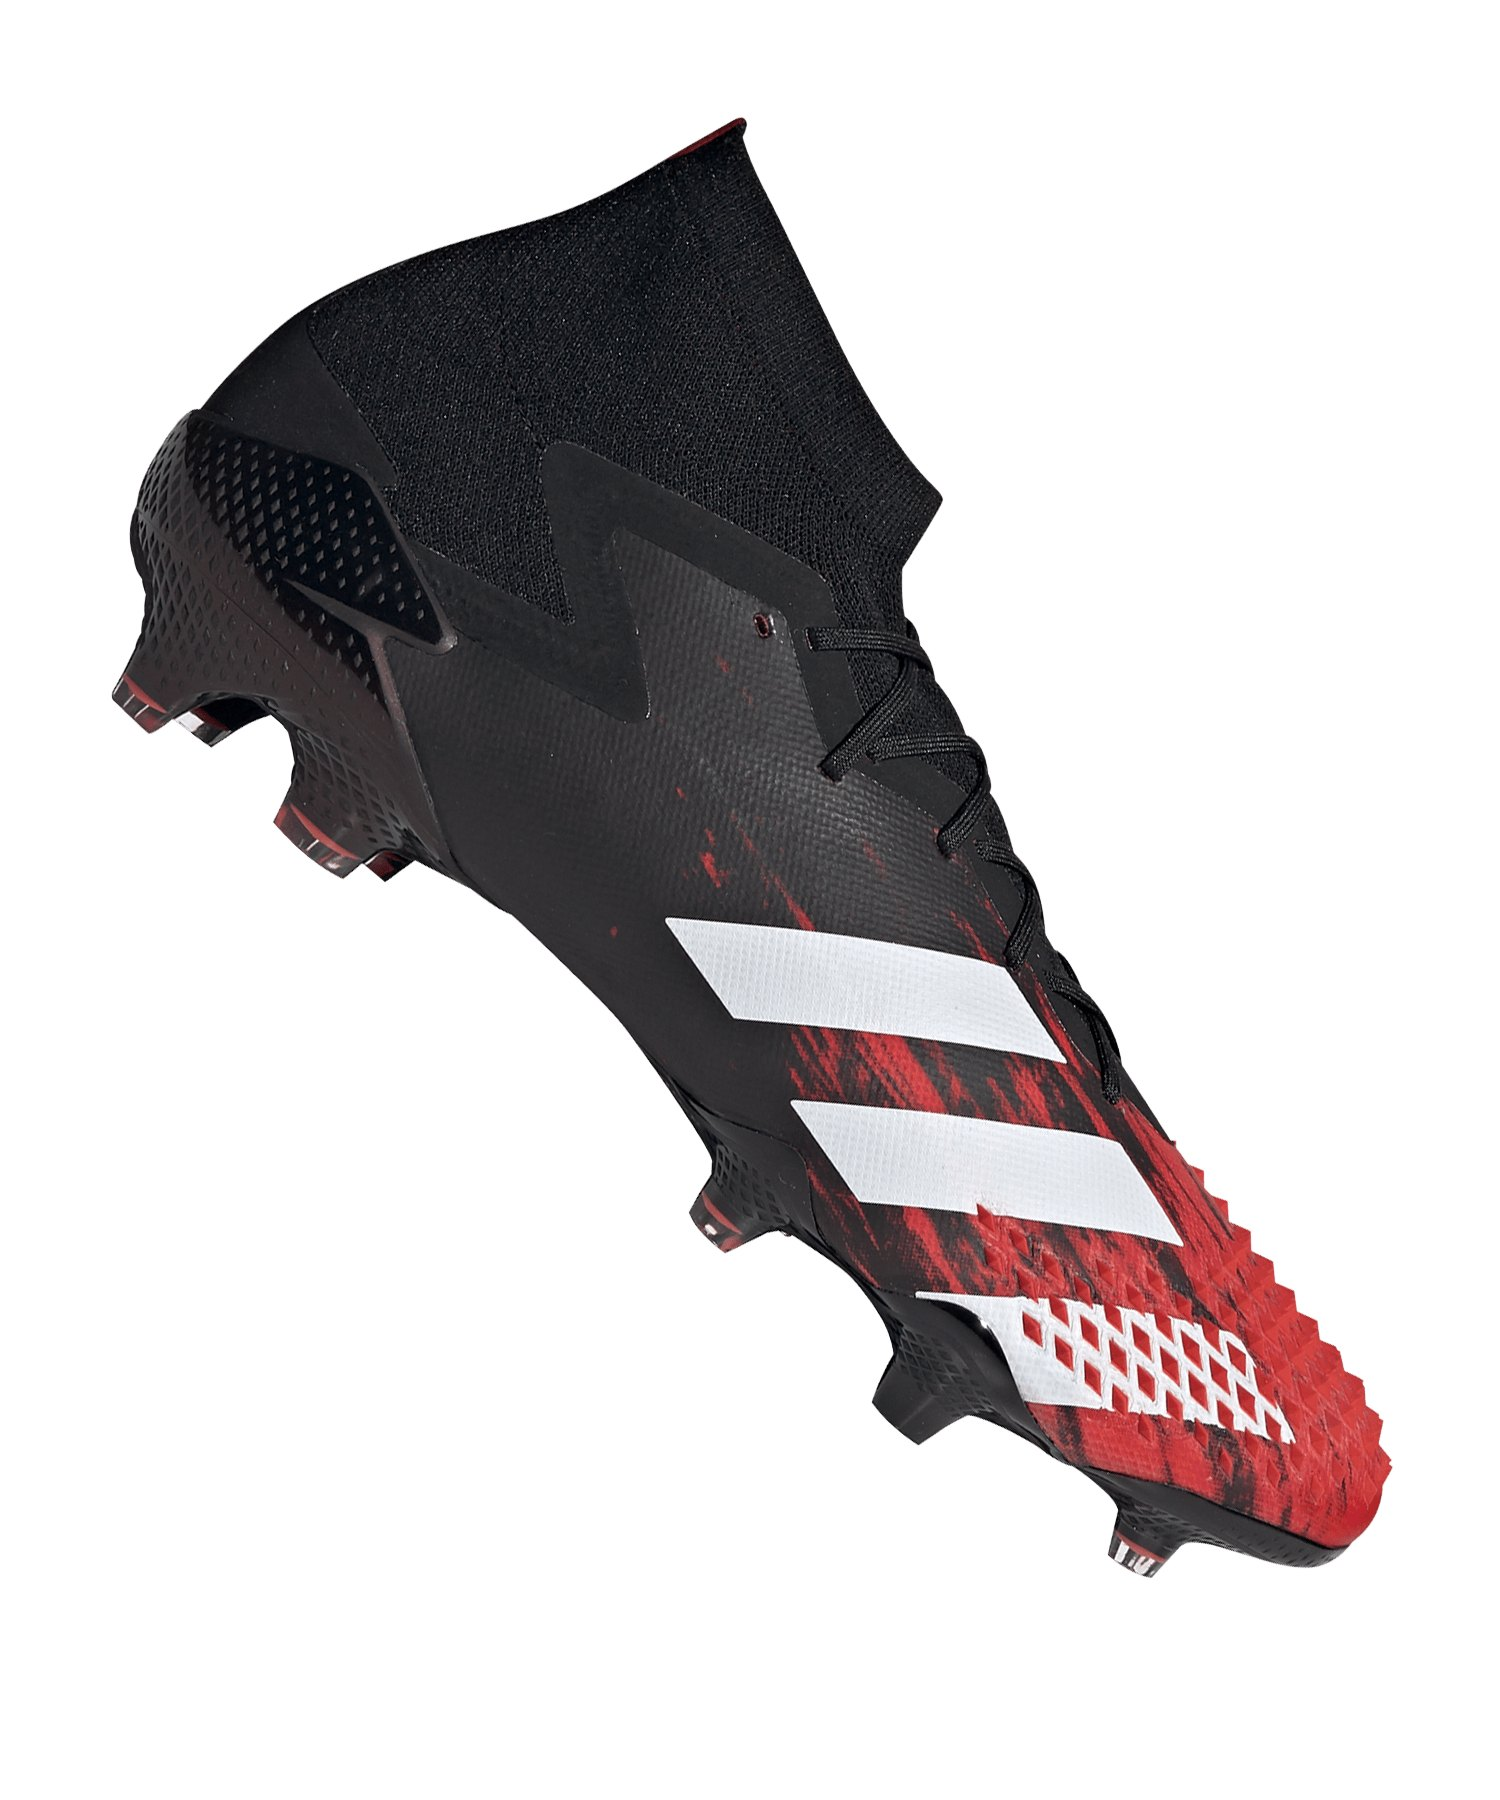 adidas Predator 20.1 FG Schwarz Rot